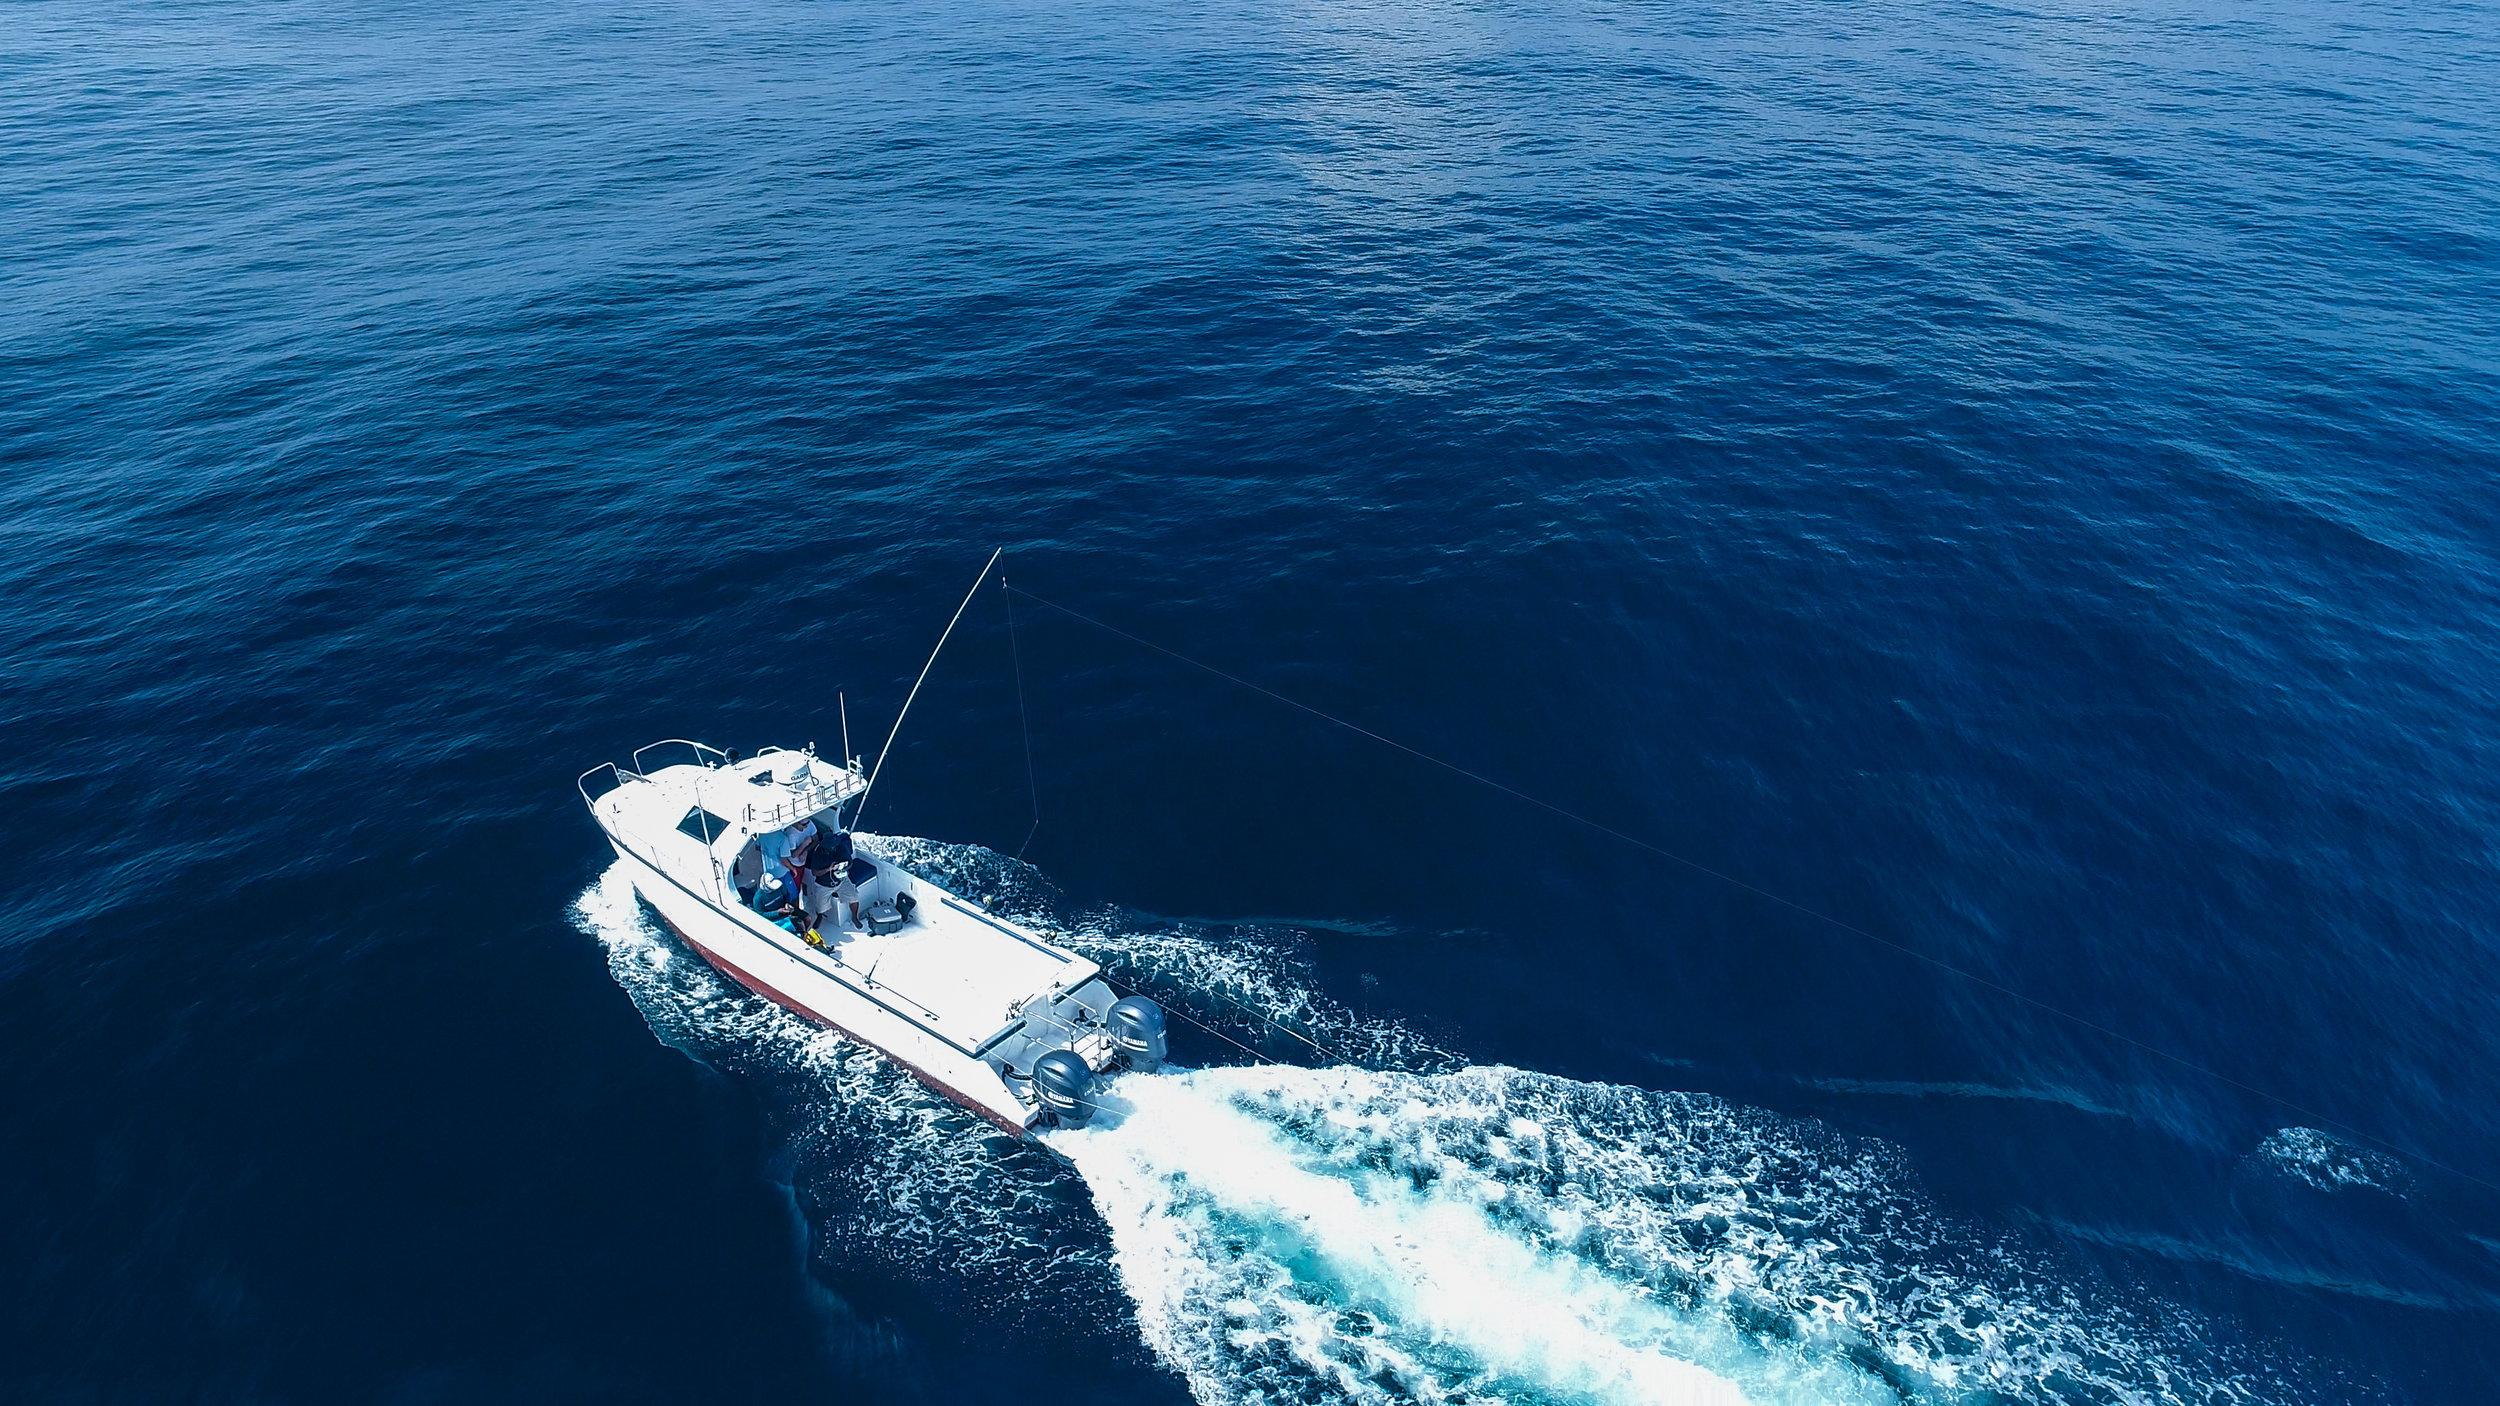 Fishing boat sri lanka deep sea fishing.jpg